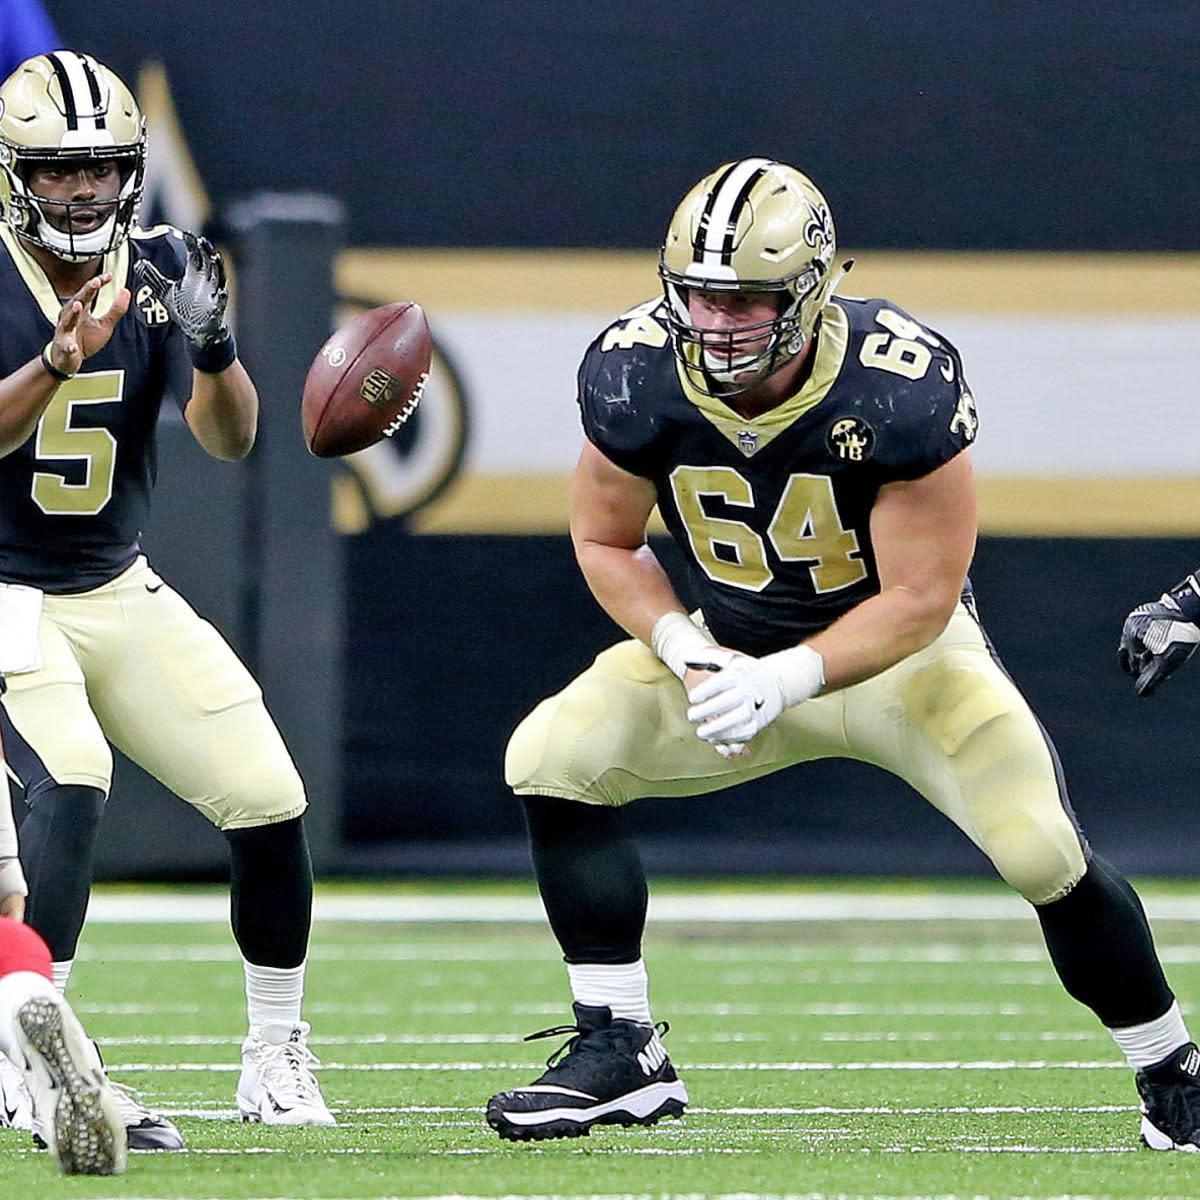 New Orleans Saints offensive lineman Will Clapp (64). Credit: Nola.com